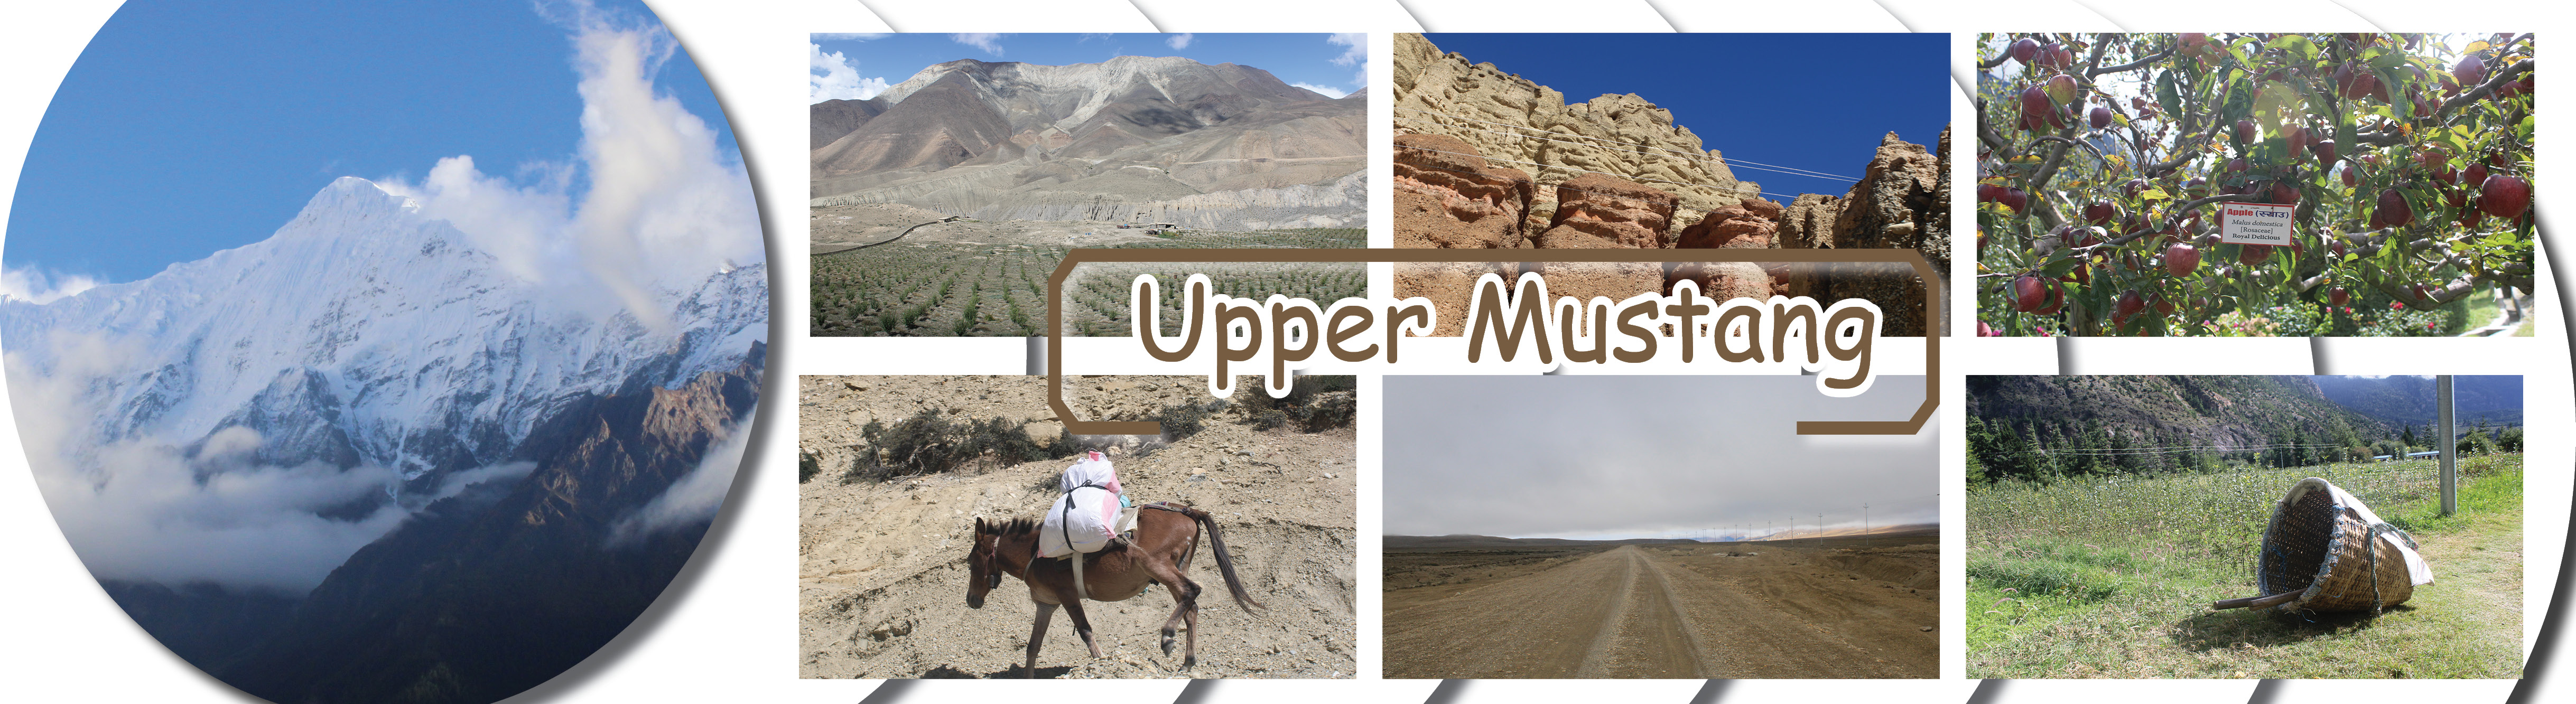 Upper Mustang (Heaven of Nepal)